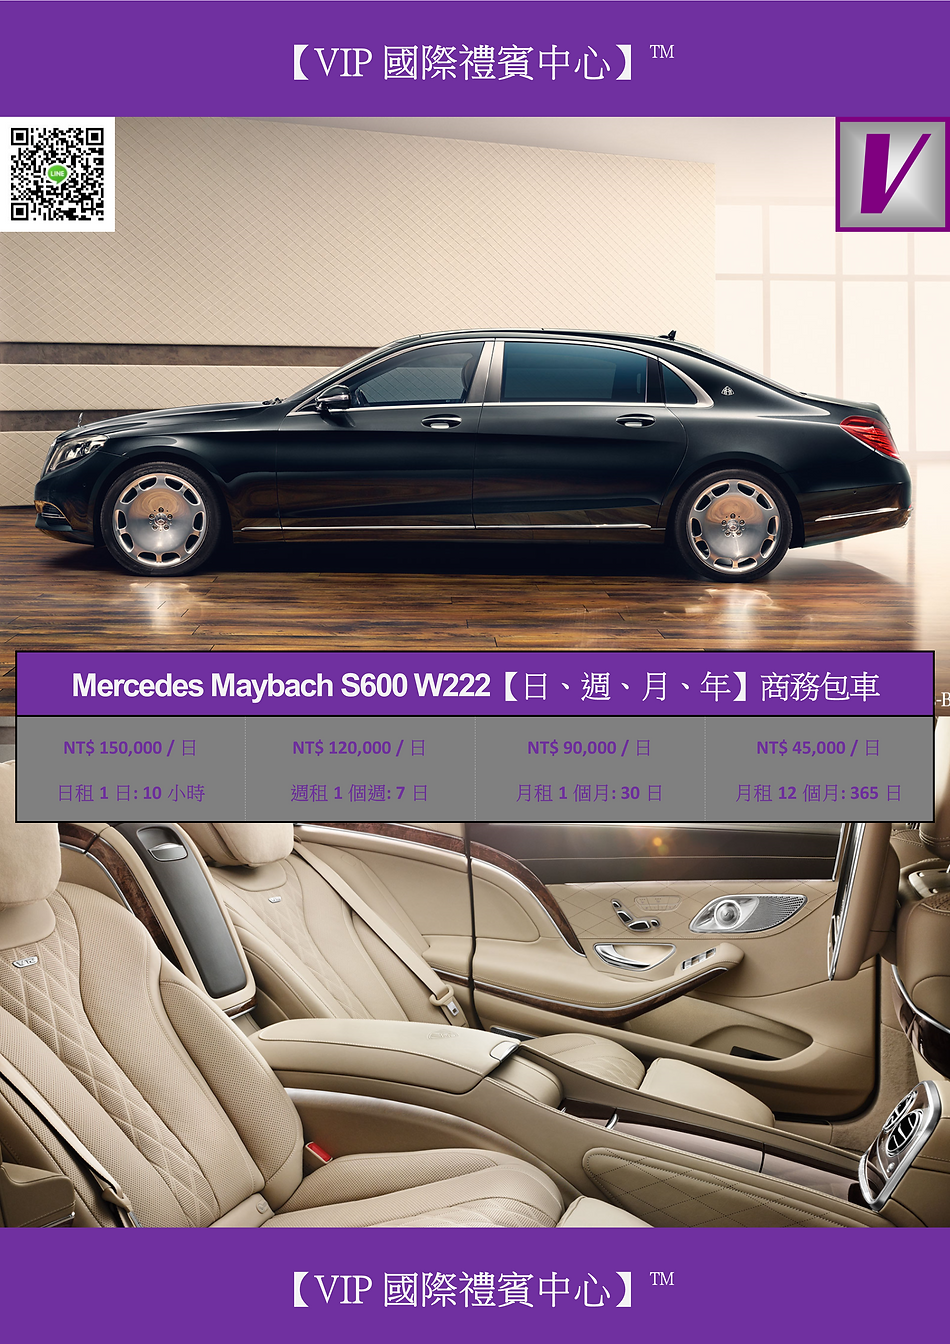 VIP國際禮賓中心 MERCEDES MAYBACH S600 W222 臺北市區接送包車